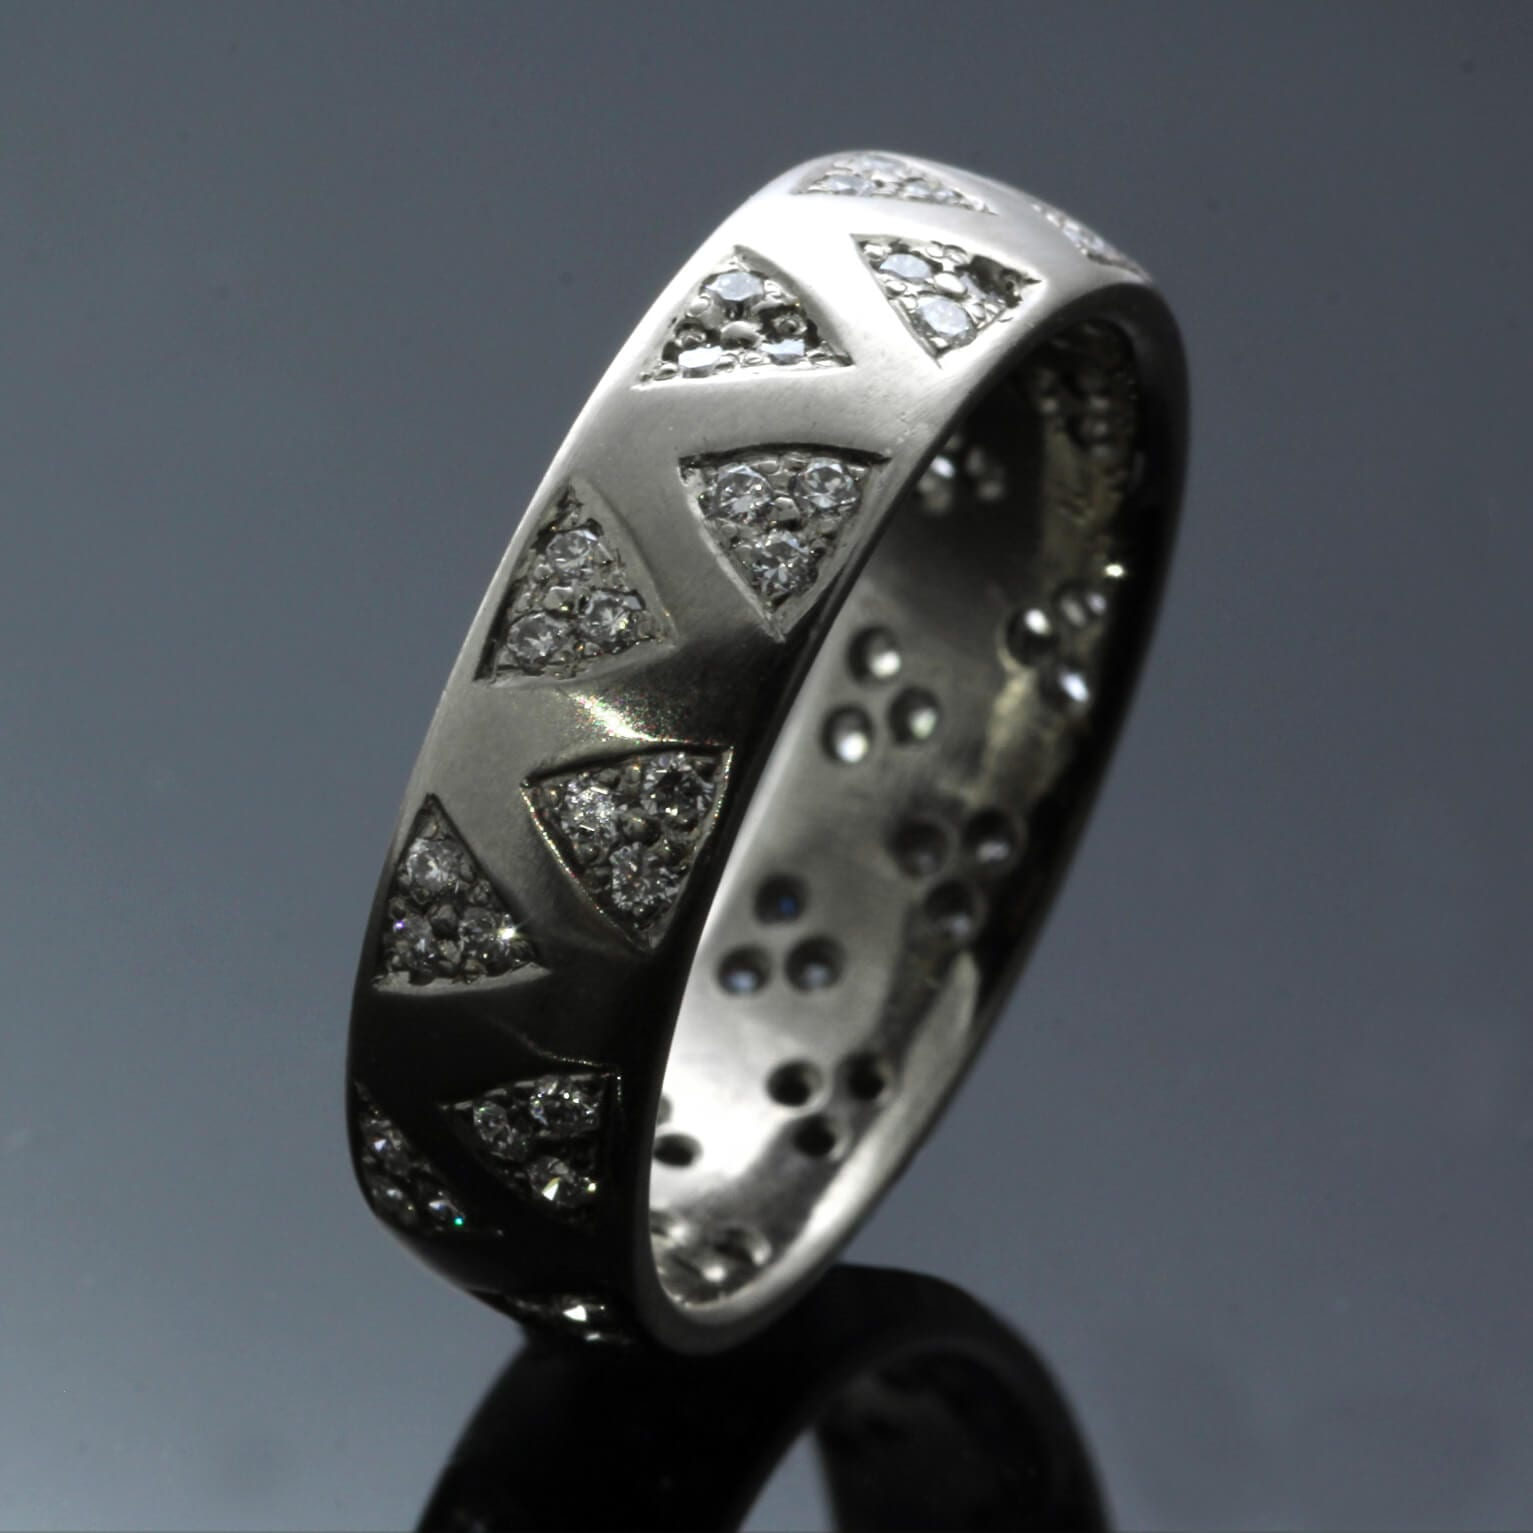 Handmade 18ct White Gold pave set Diamonds handmade modern ring